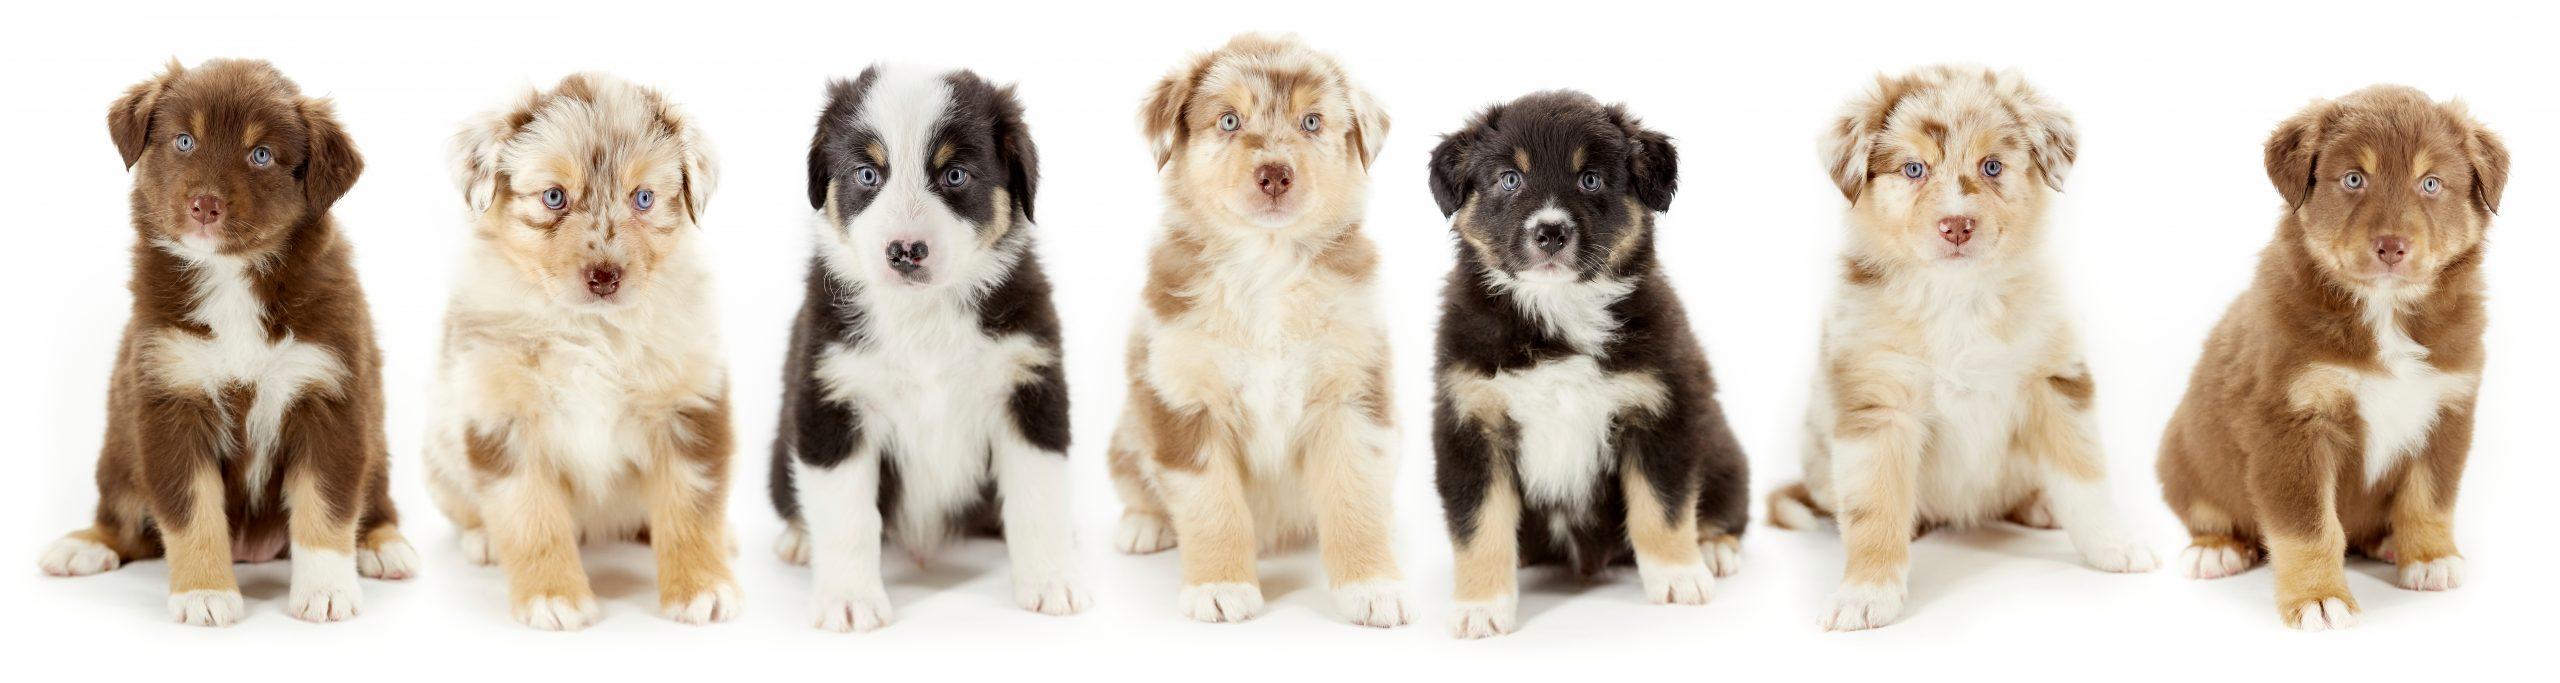 Puppypanorama